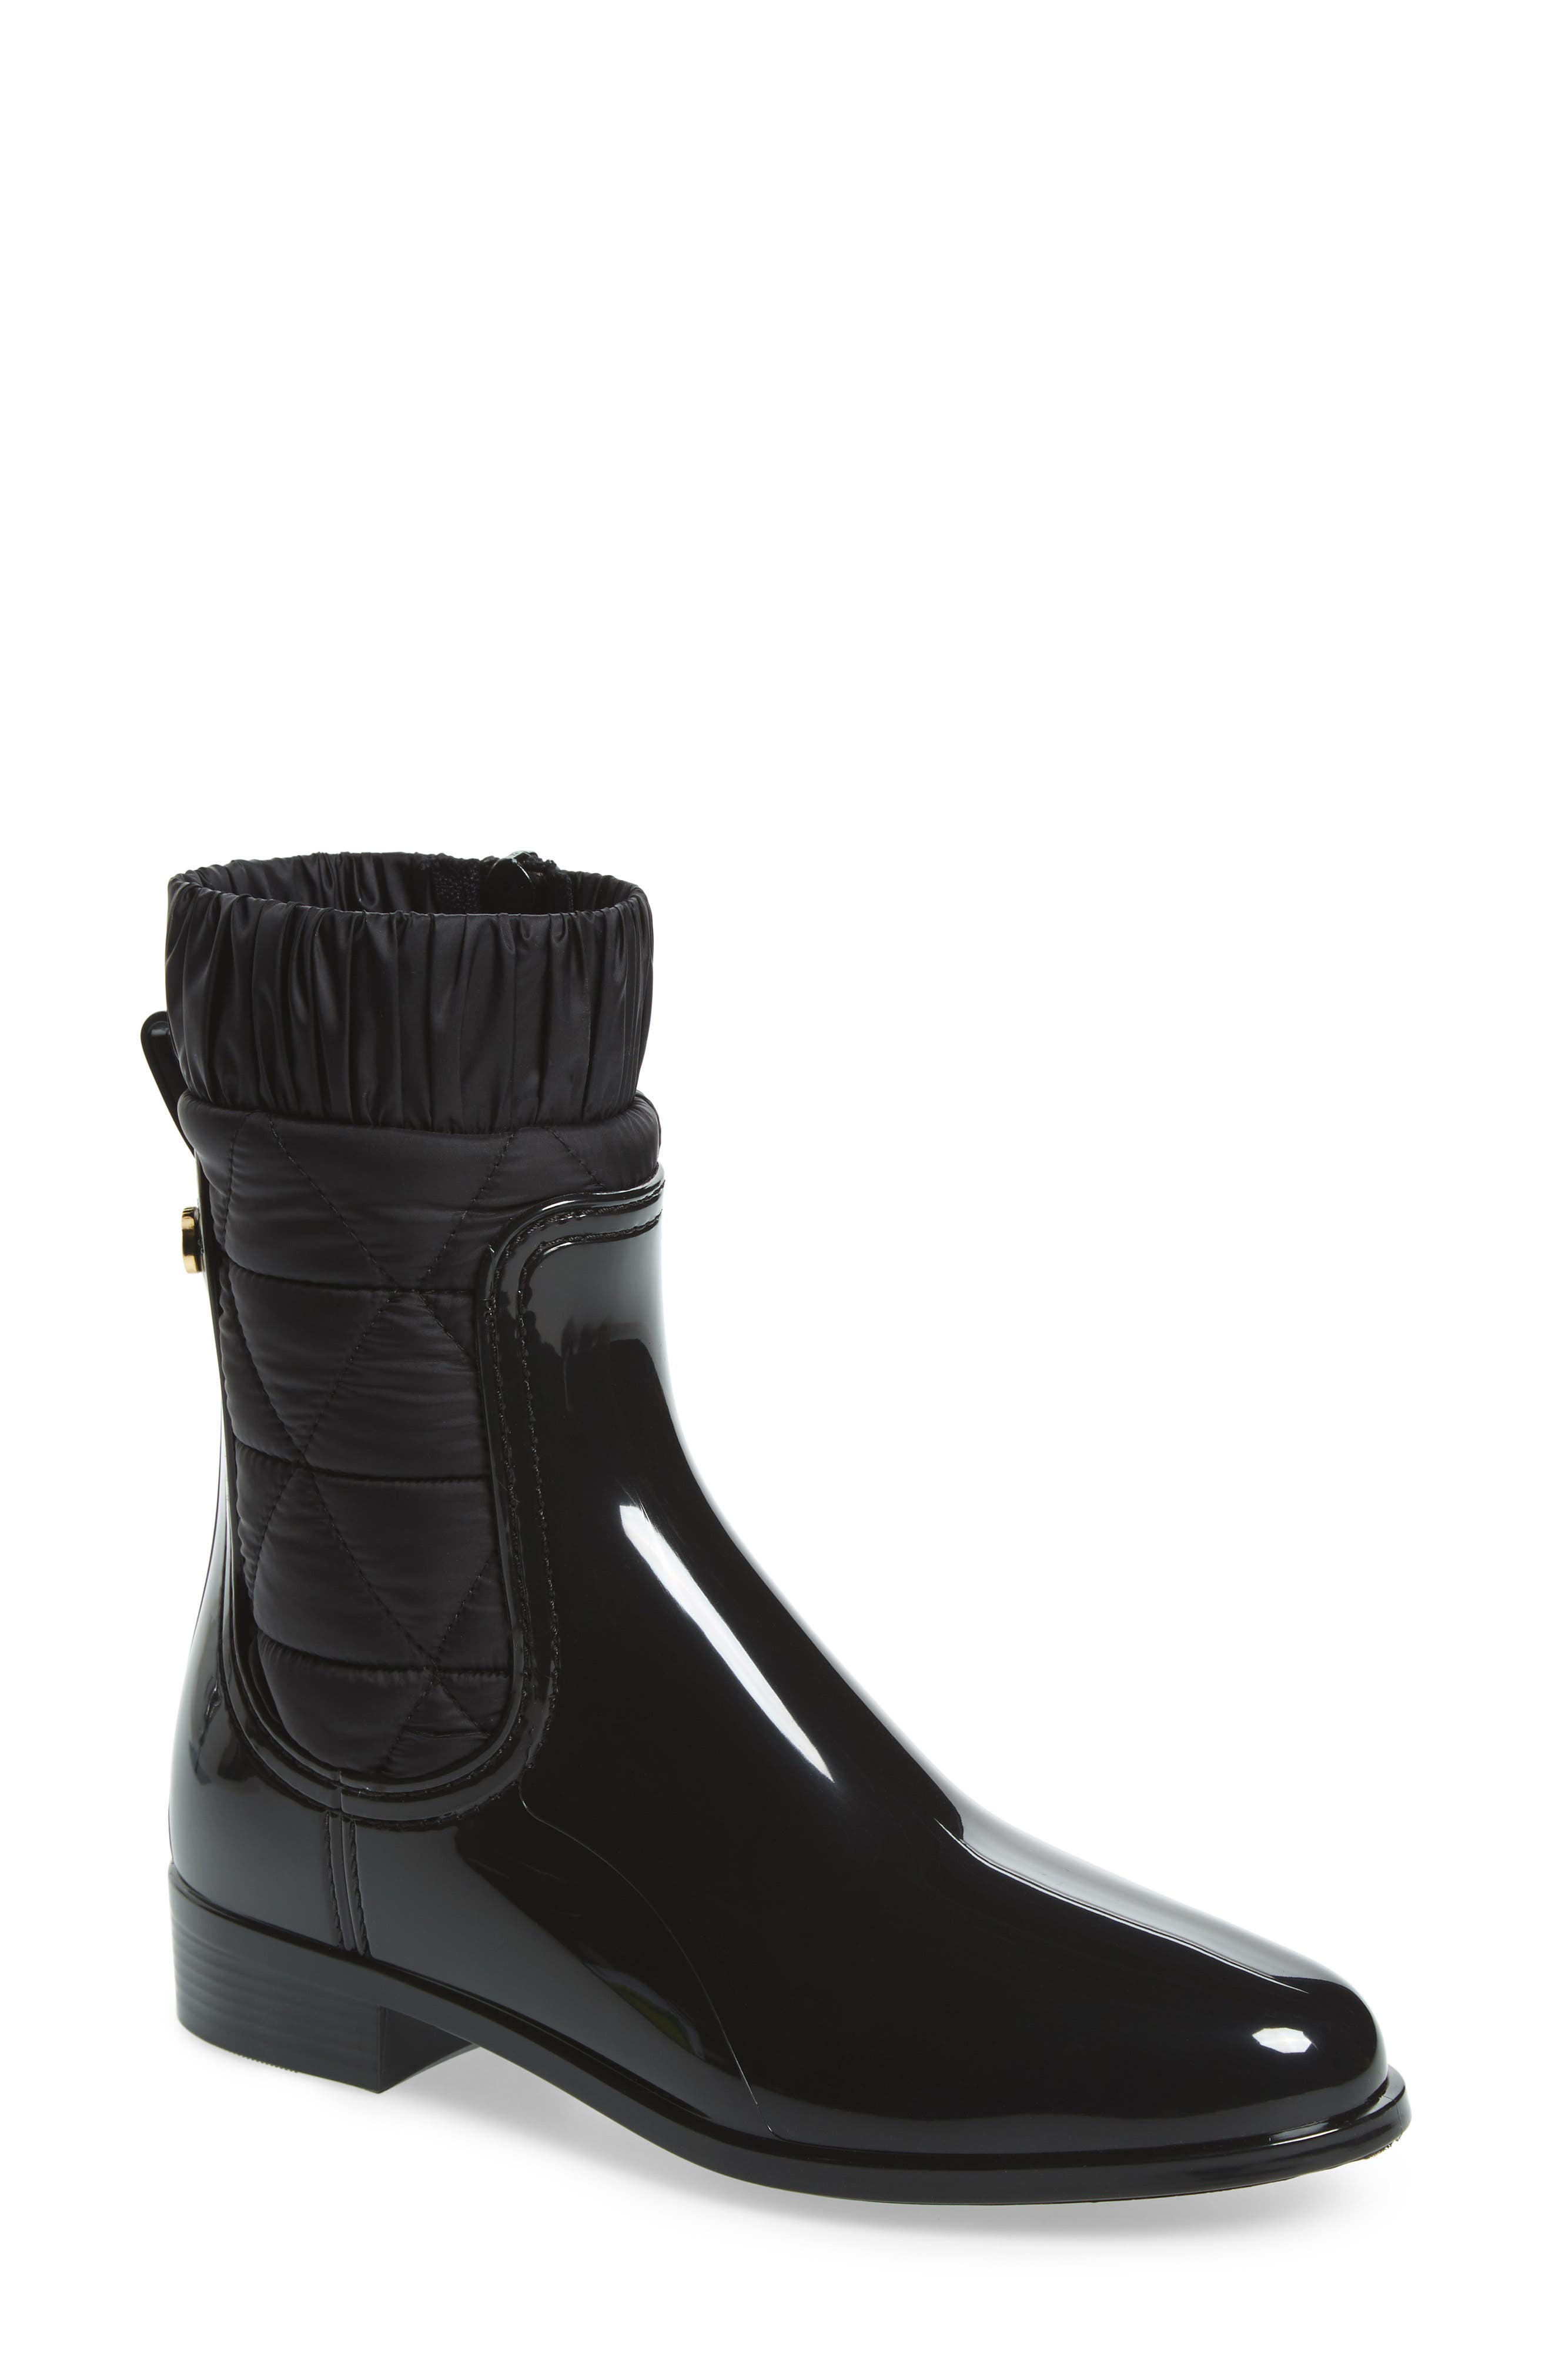 Adele Waterproof Boot,                         Main,                         color, 001